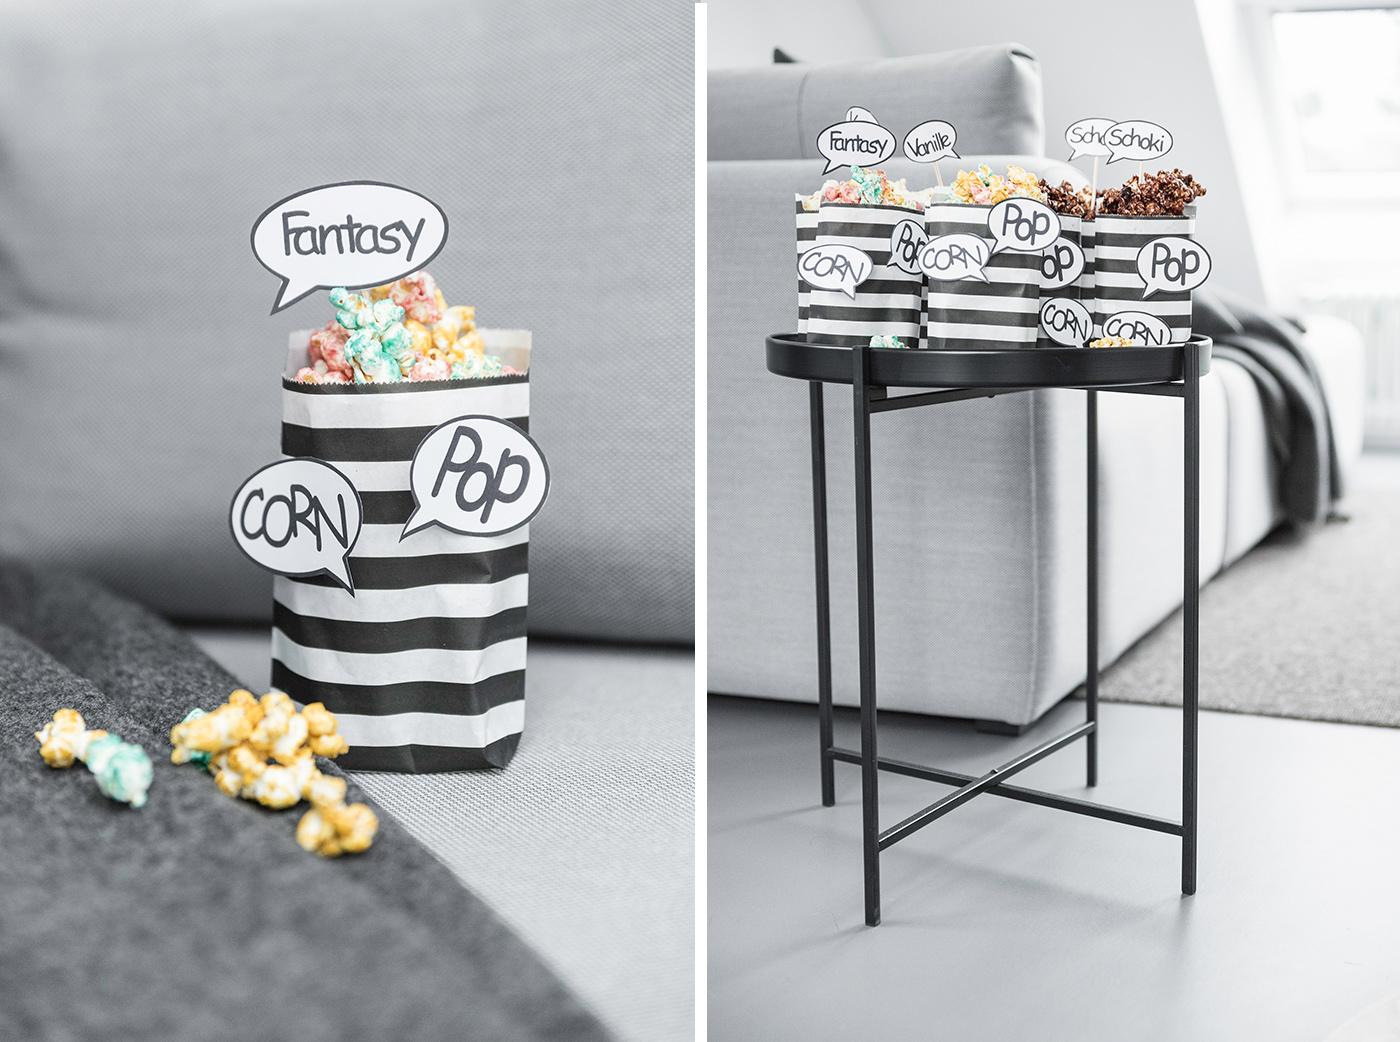 Popcornrezepte - Popcorn wie im Kino